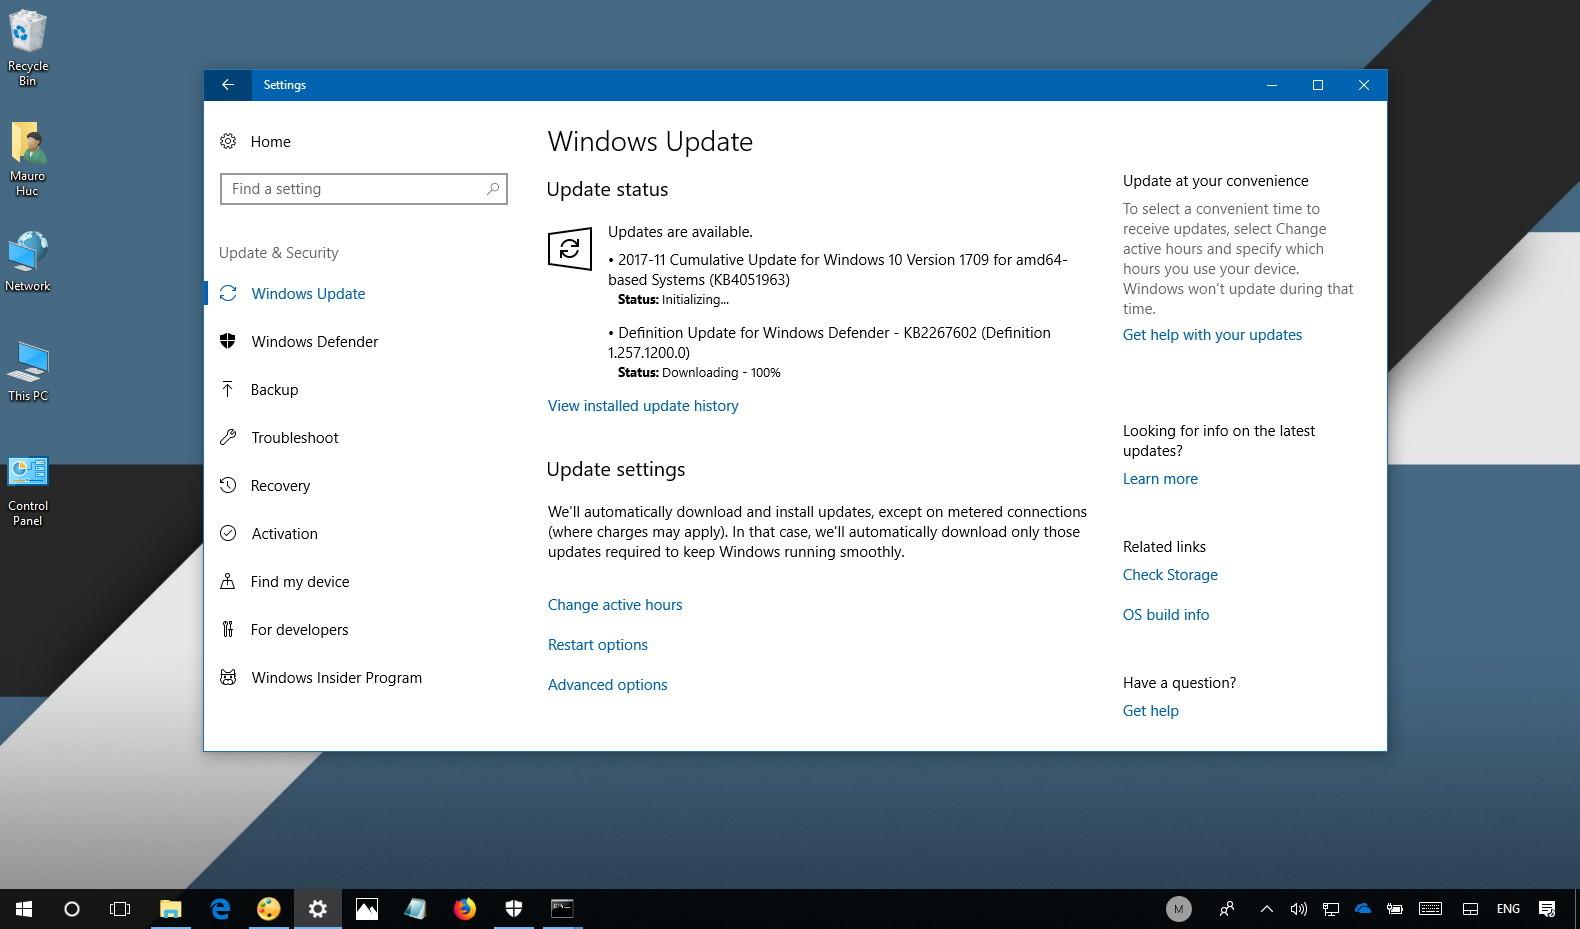 Windows 10 update KB4051963